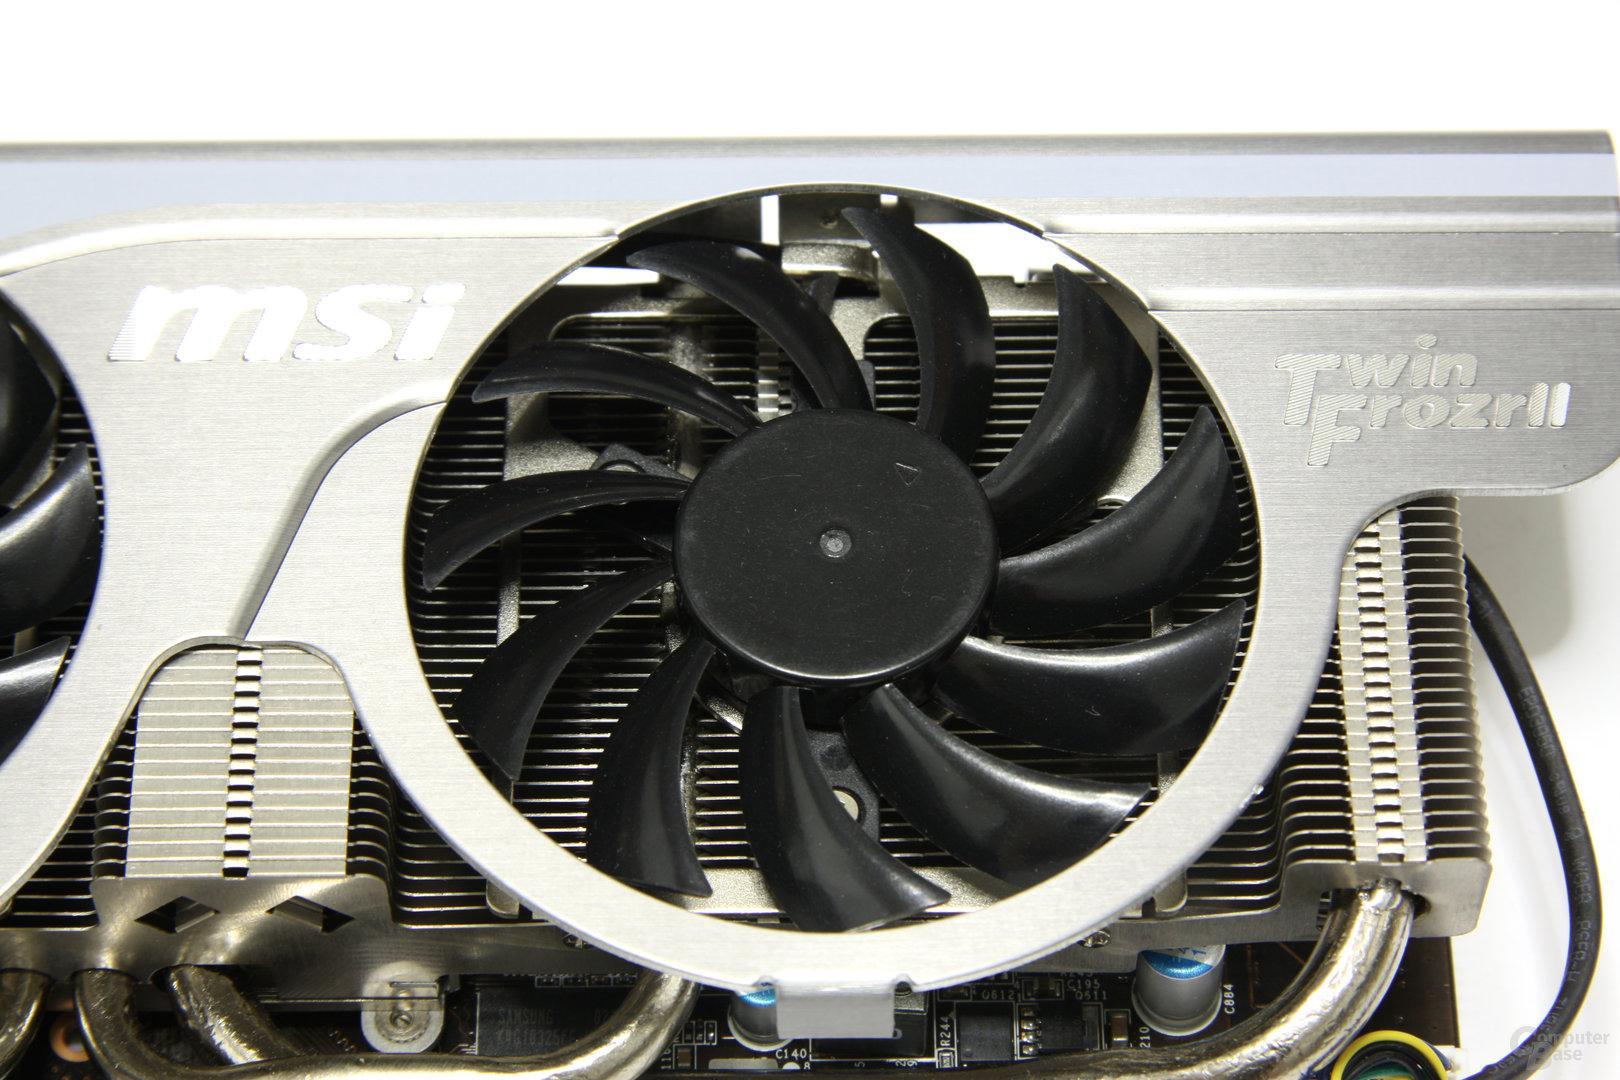 GeForce GTX 460 Hawk Lüfter